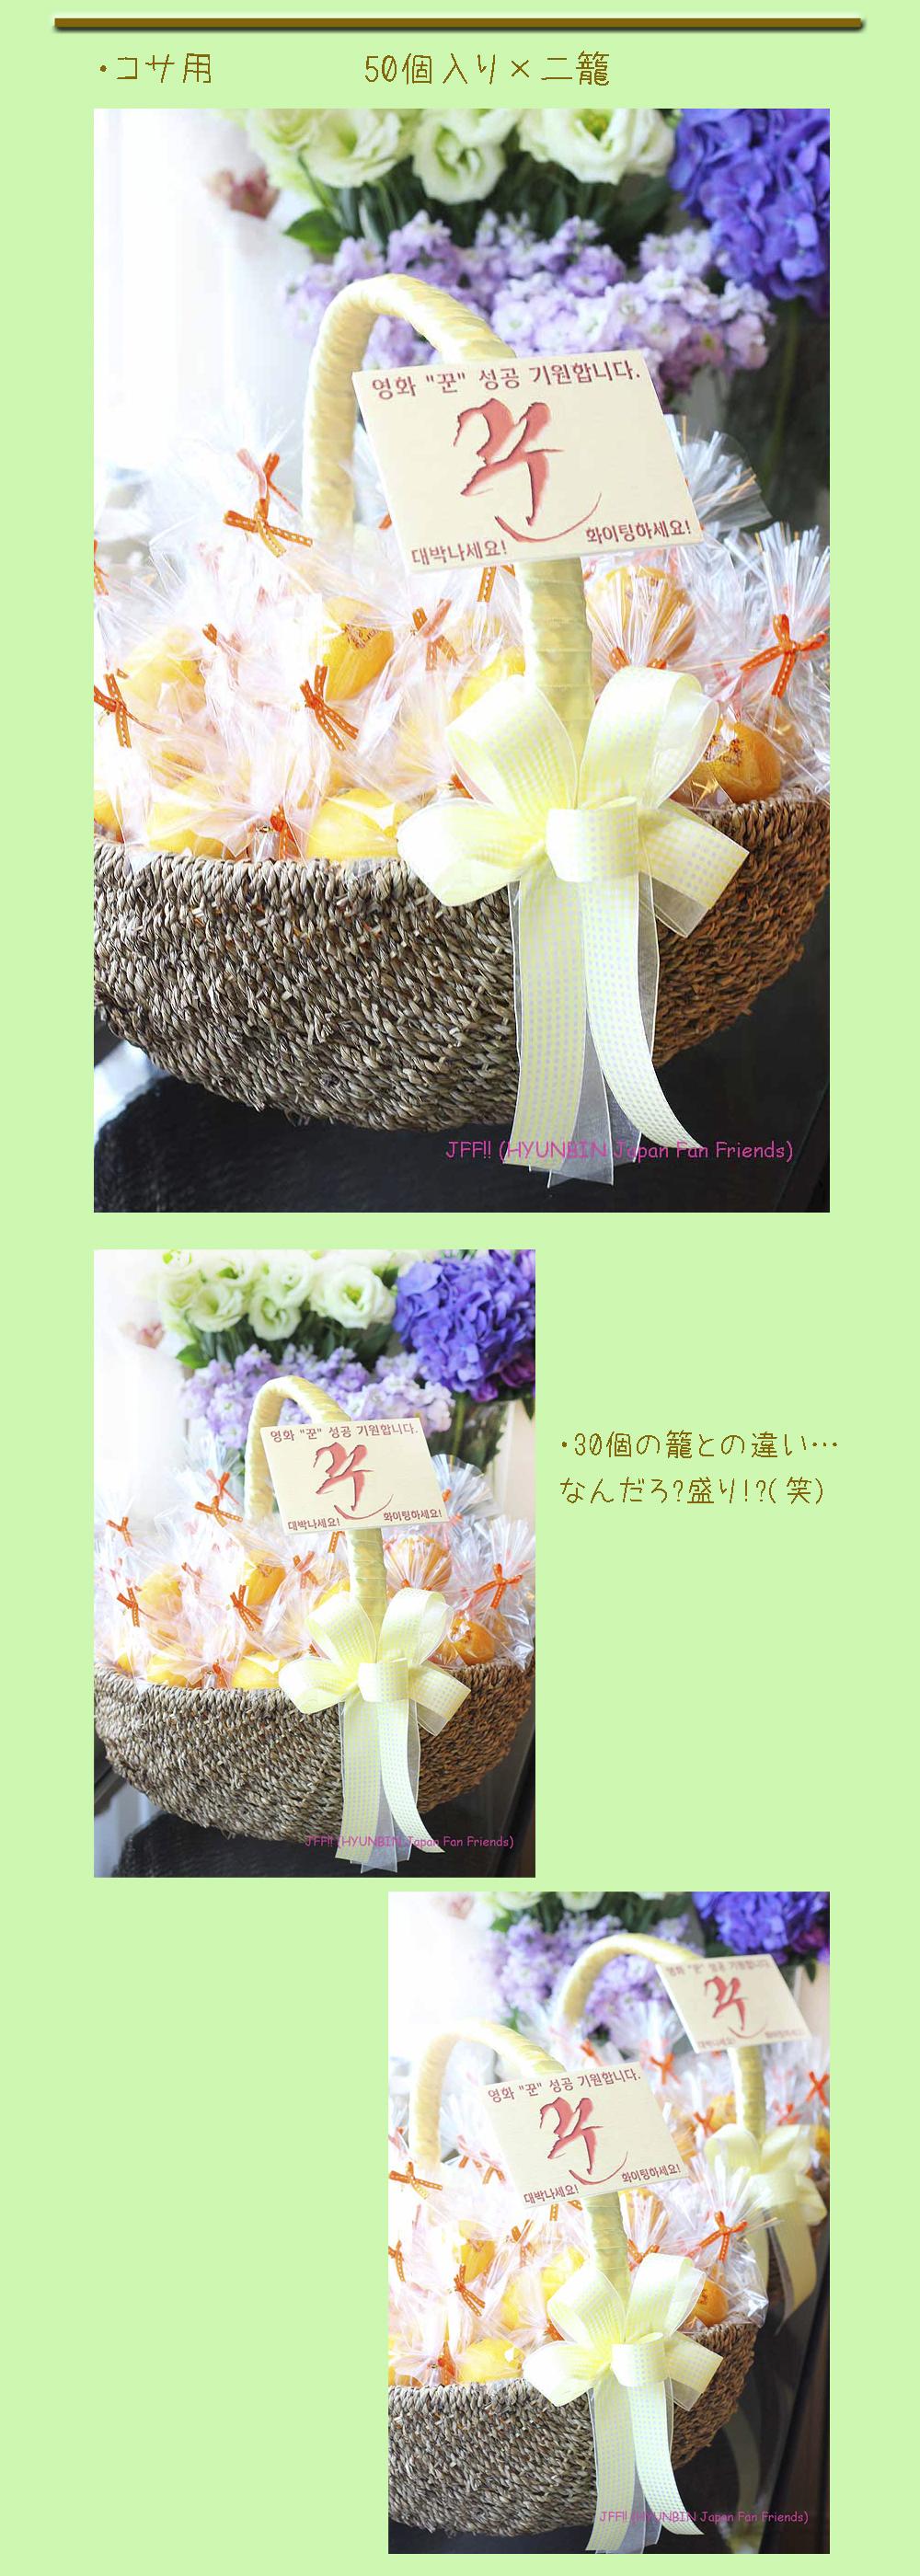 20160926_mikan_02.jpg